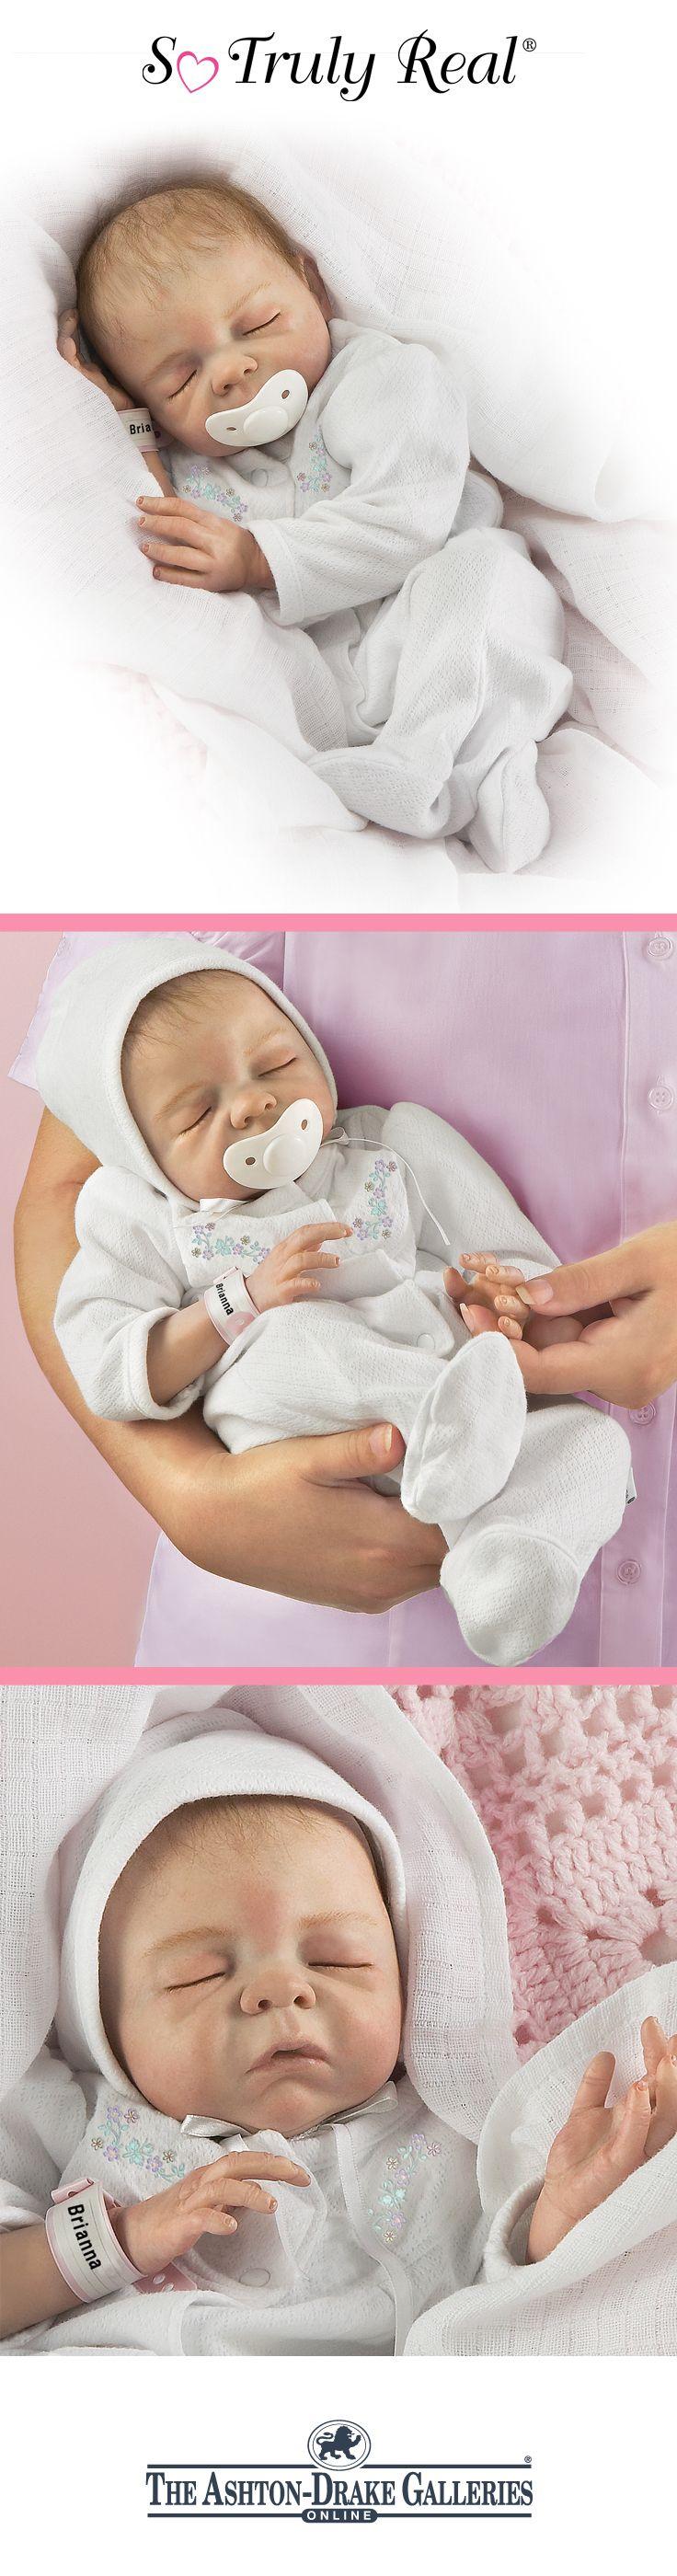 19 best Dolls images on Pinterest